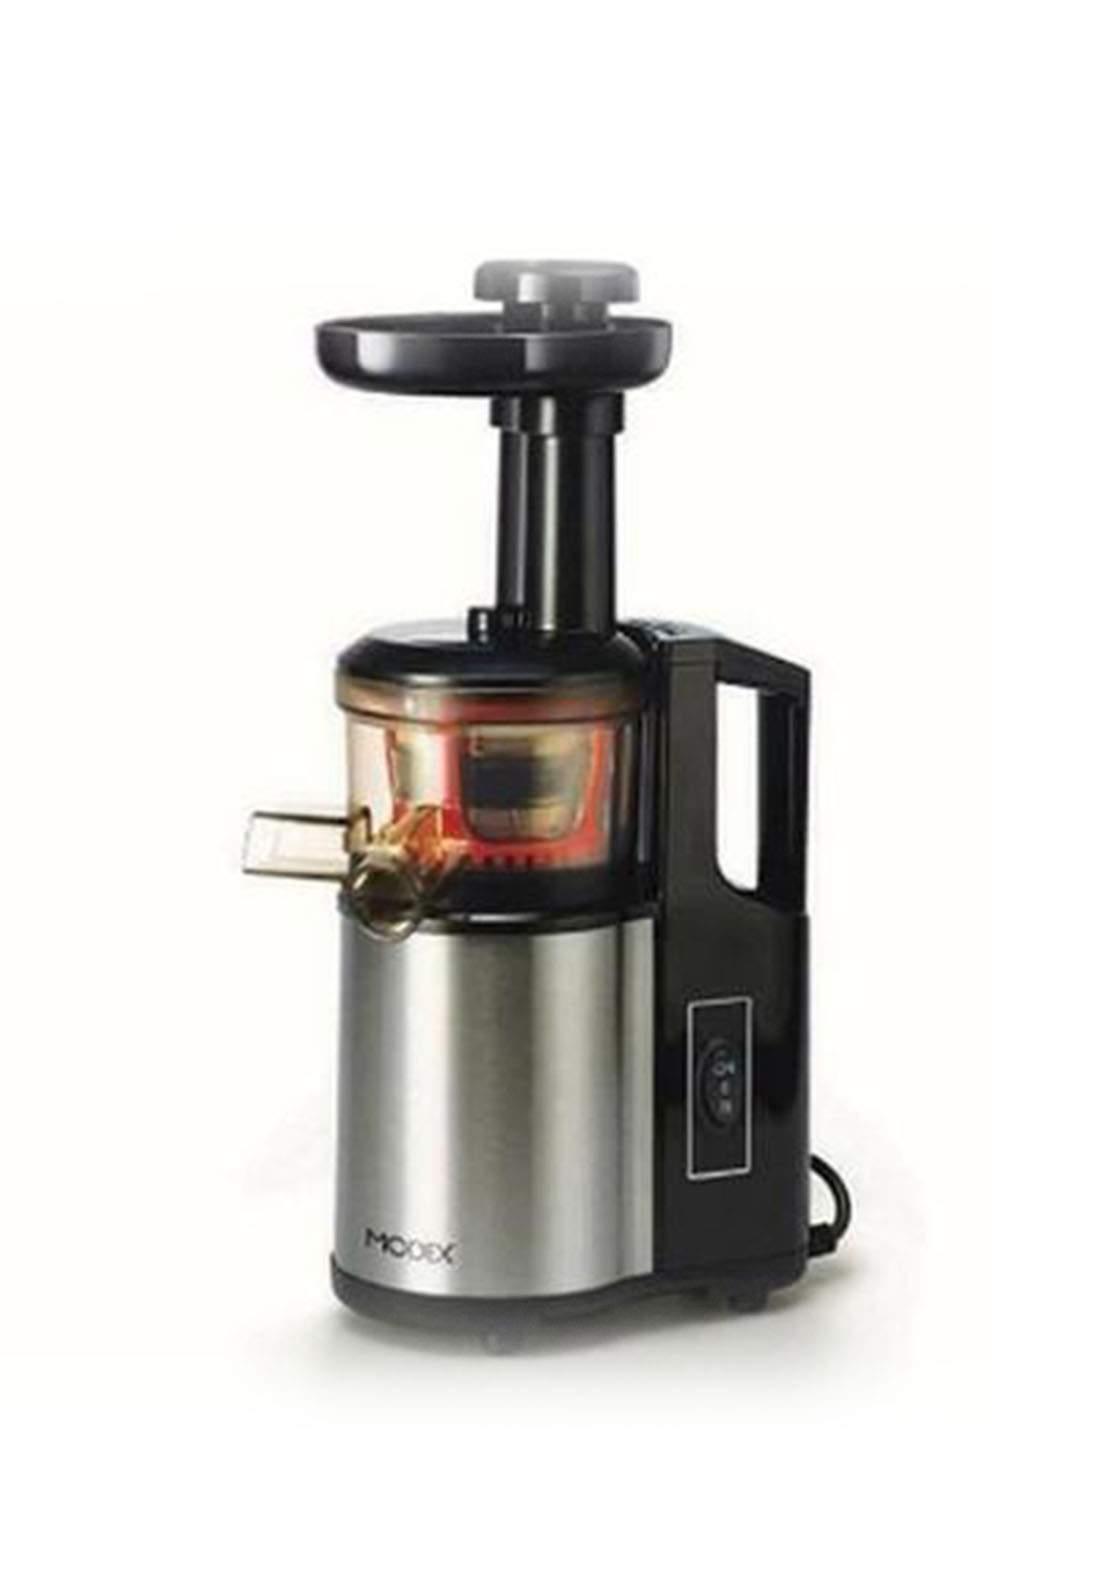 Gosonic GSJ1150 juicer عصارة